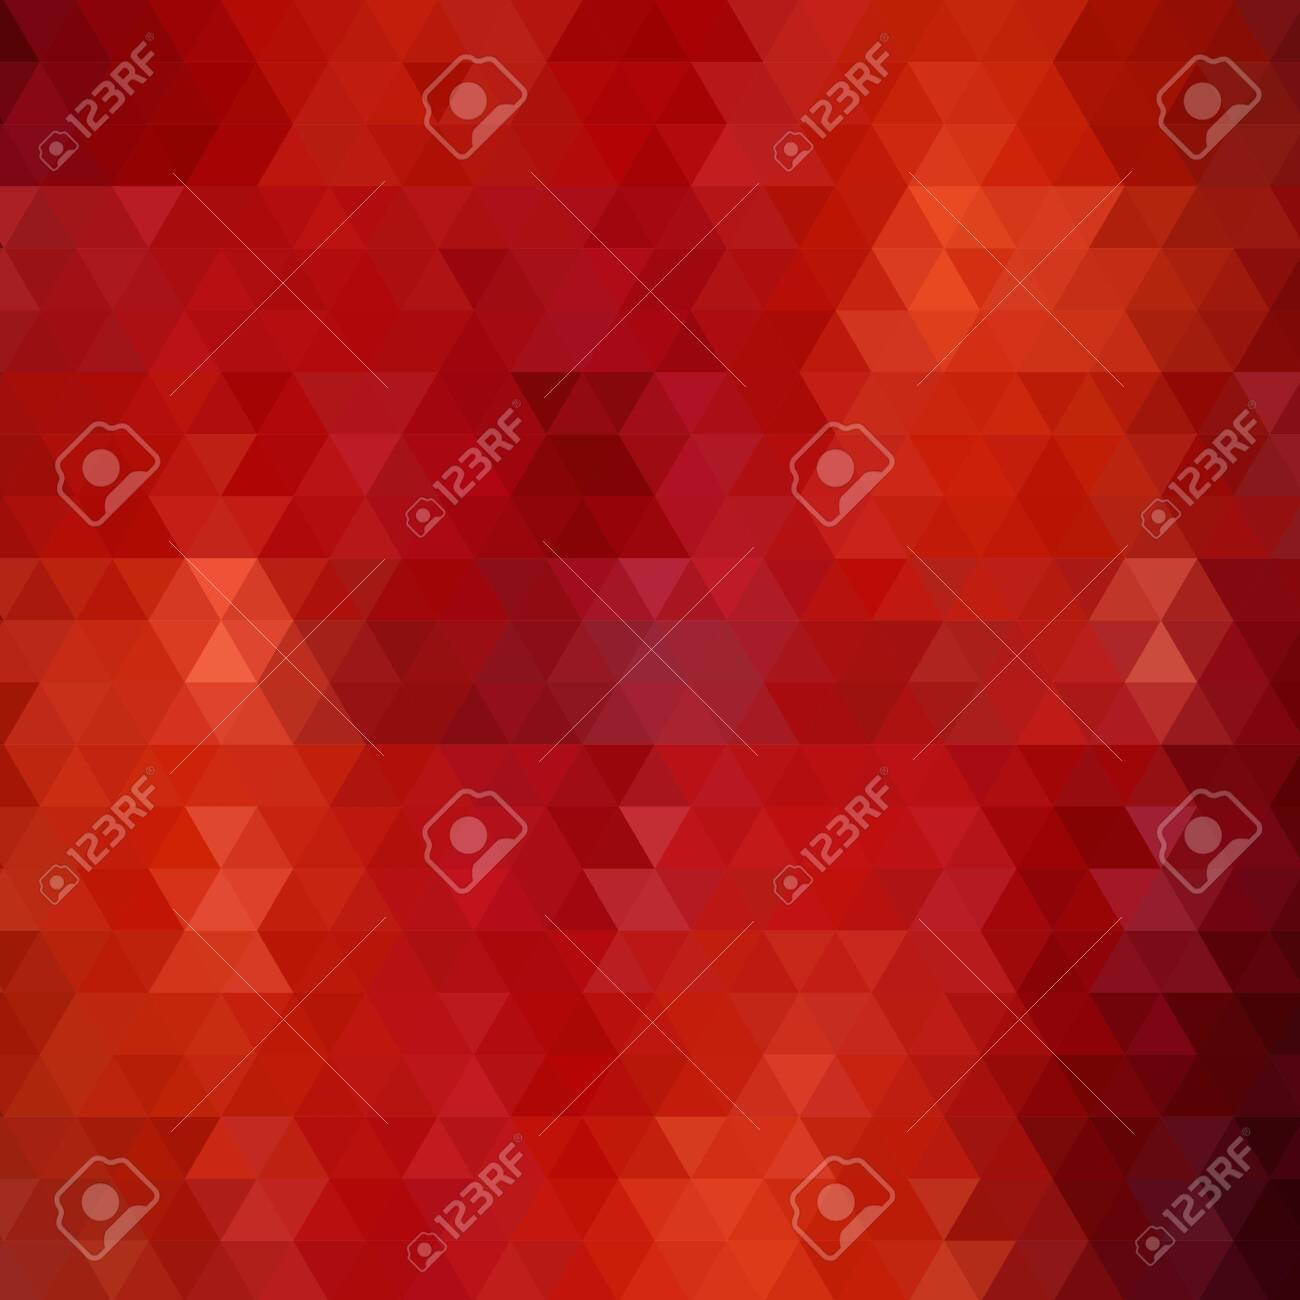 triangular background. polygonal style - 124475677